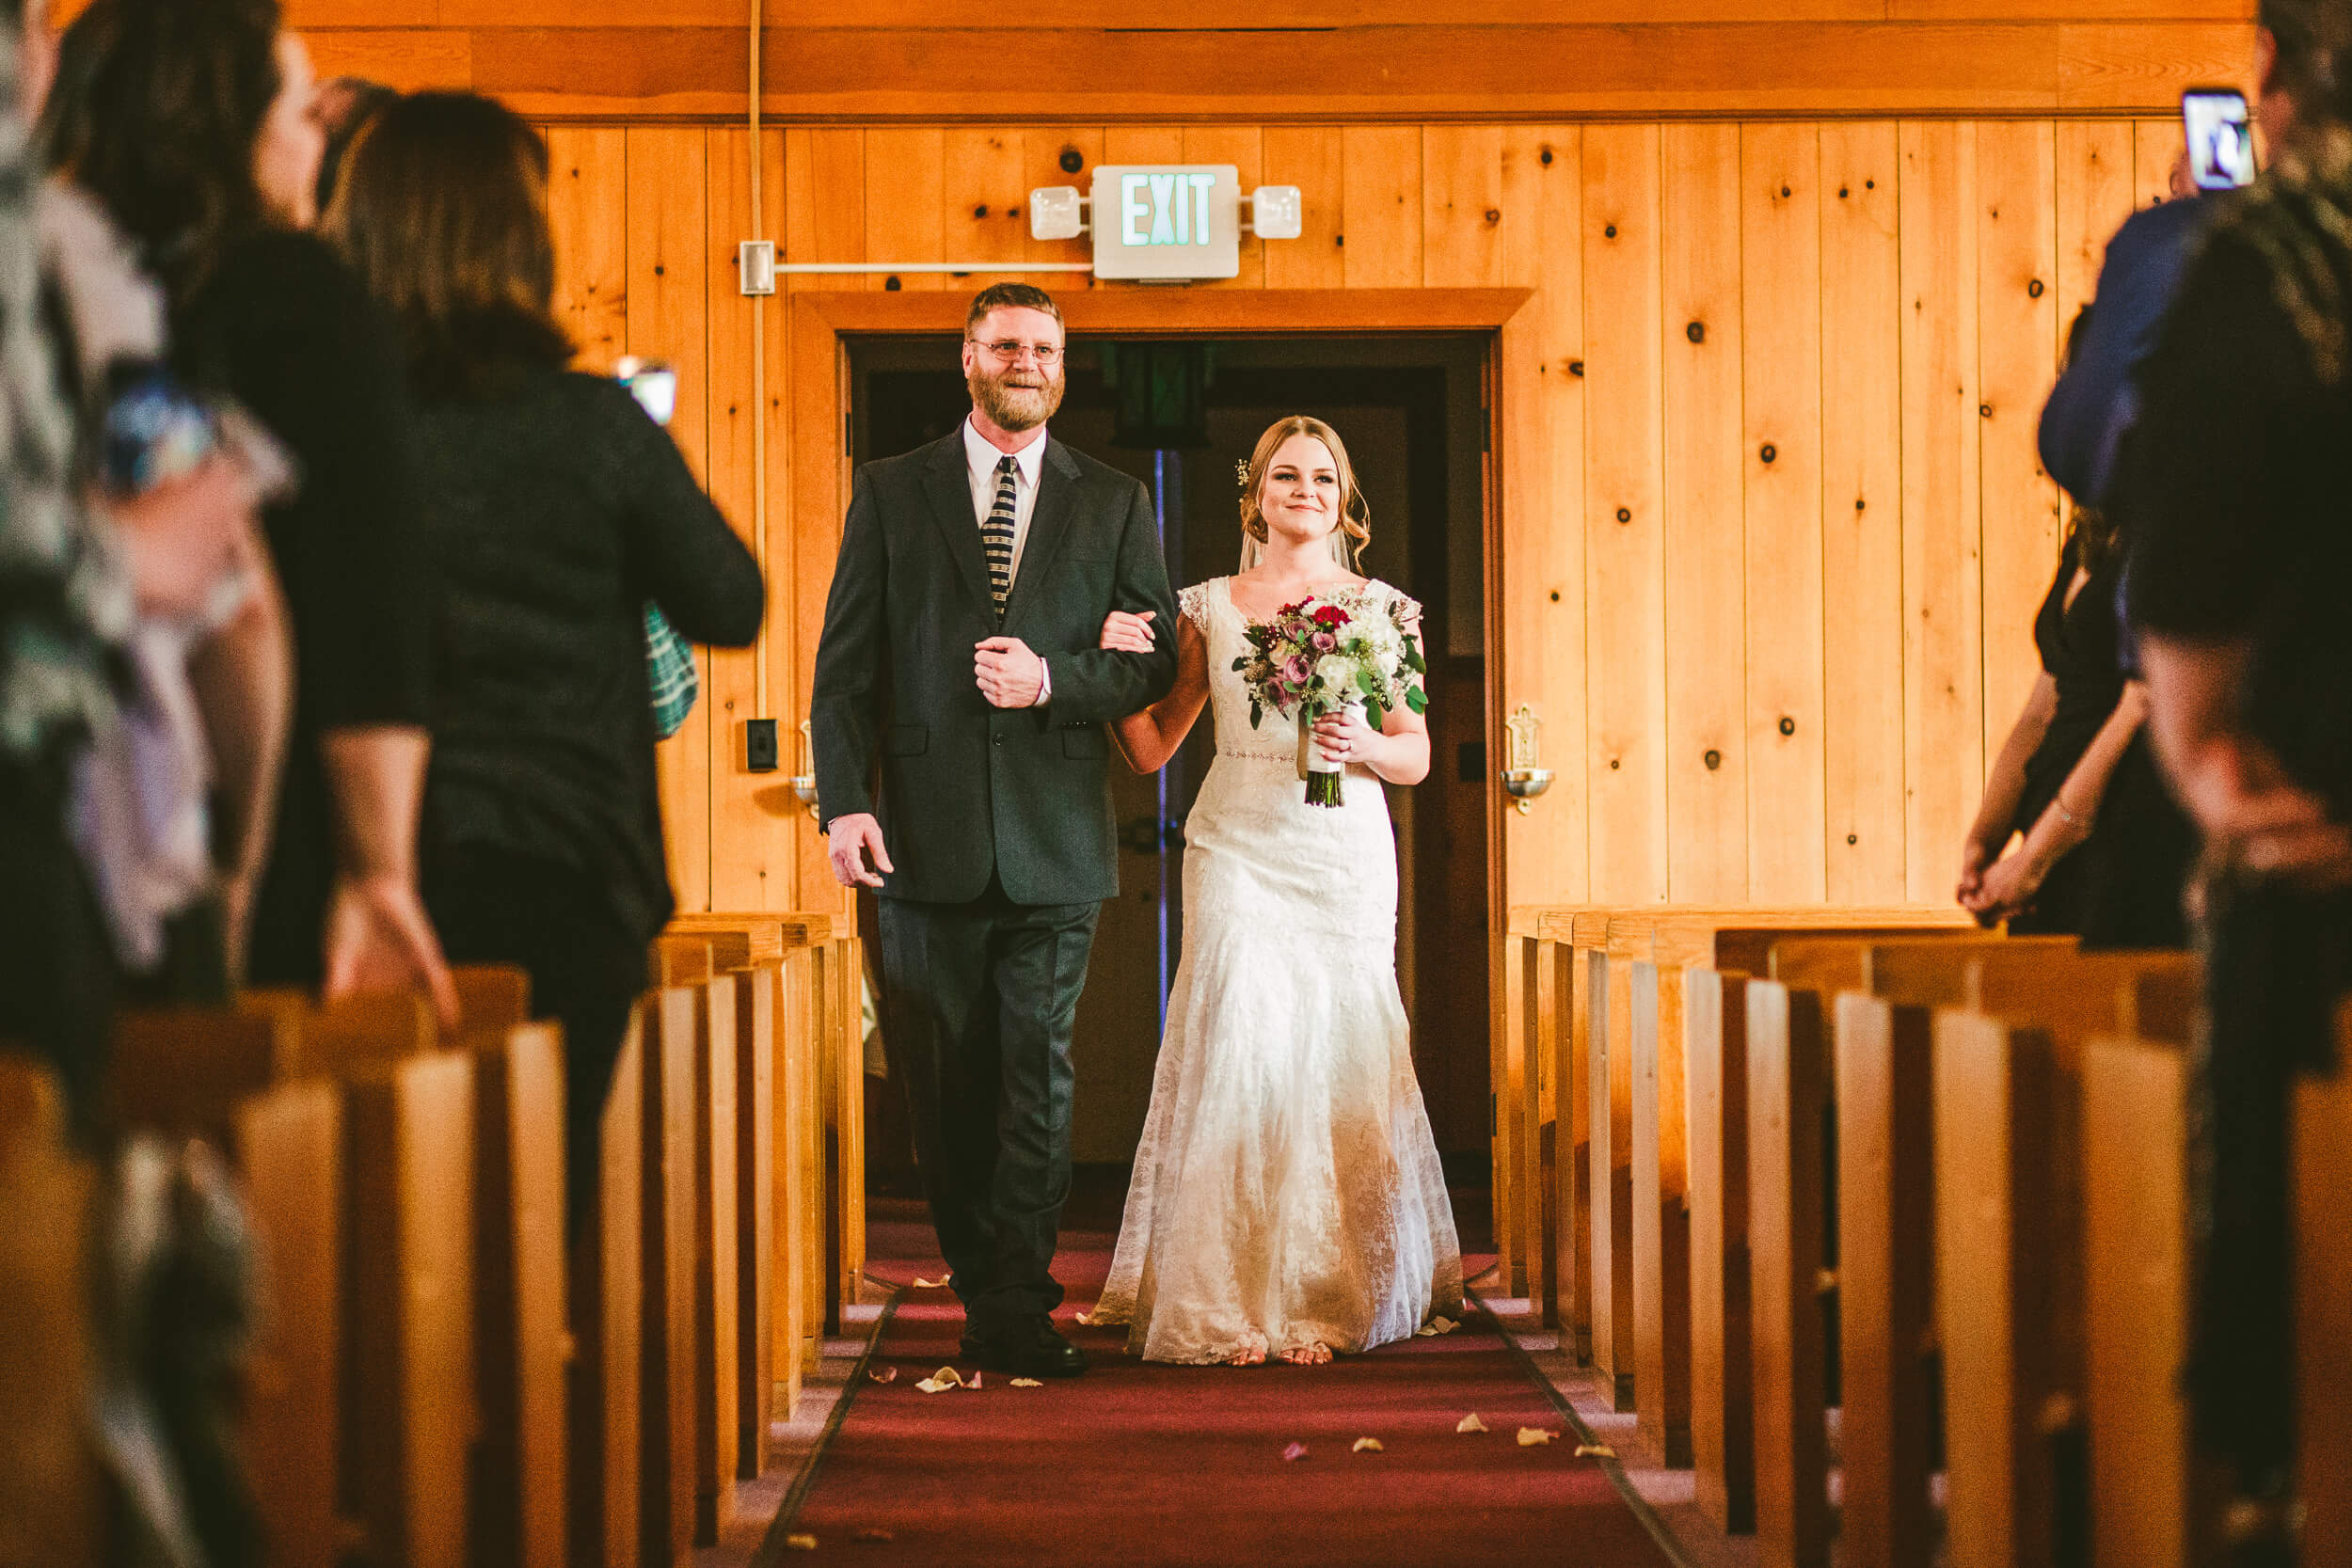 mukogawa winter wedding in spokane (149).jpg